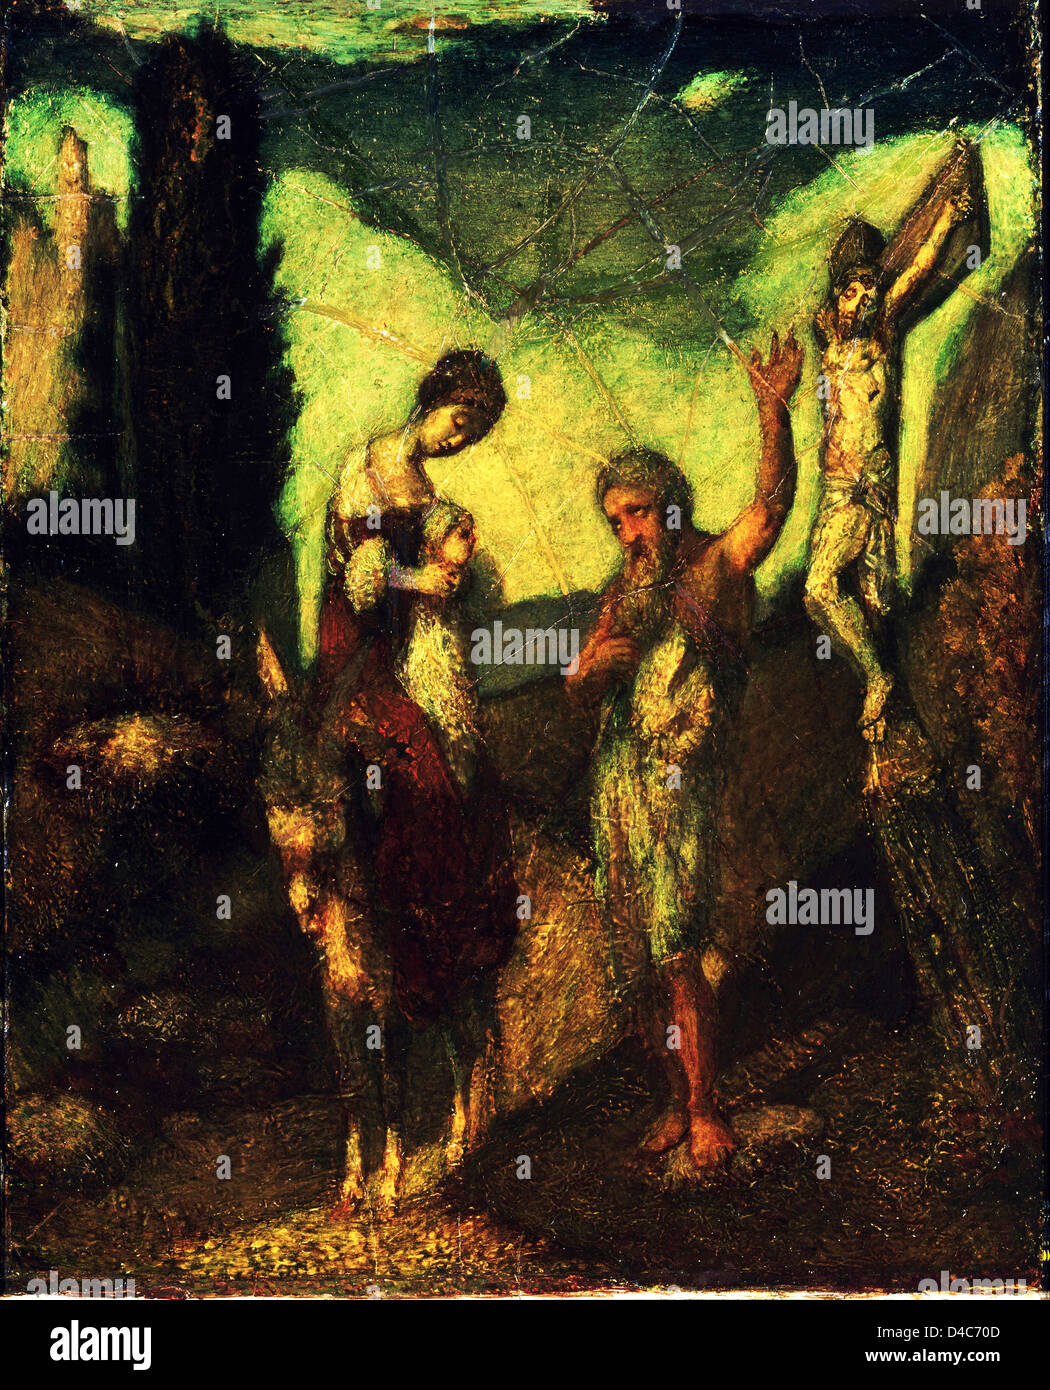 Albert Pinkham Ryder, The Story of the Cross. Circa 1890. Oil on canvas. Princeton University Art Museum, Princeton, - Stock Image